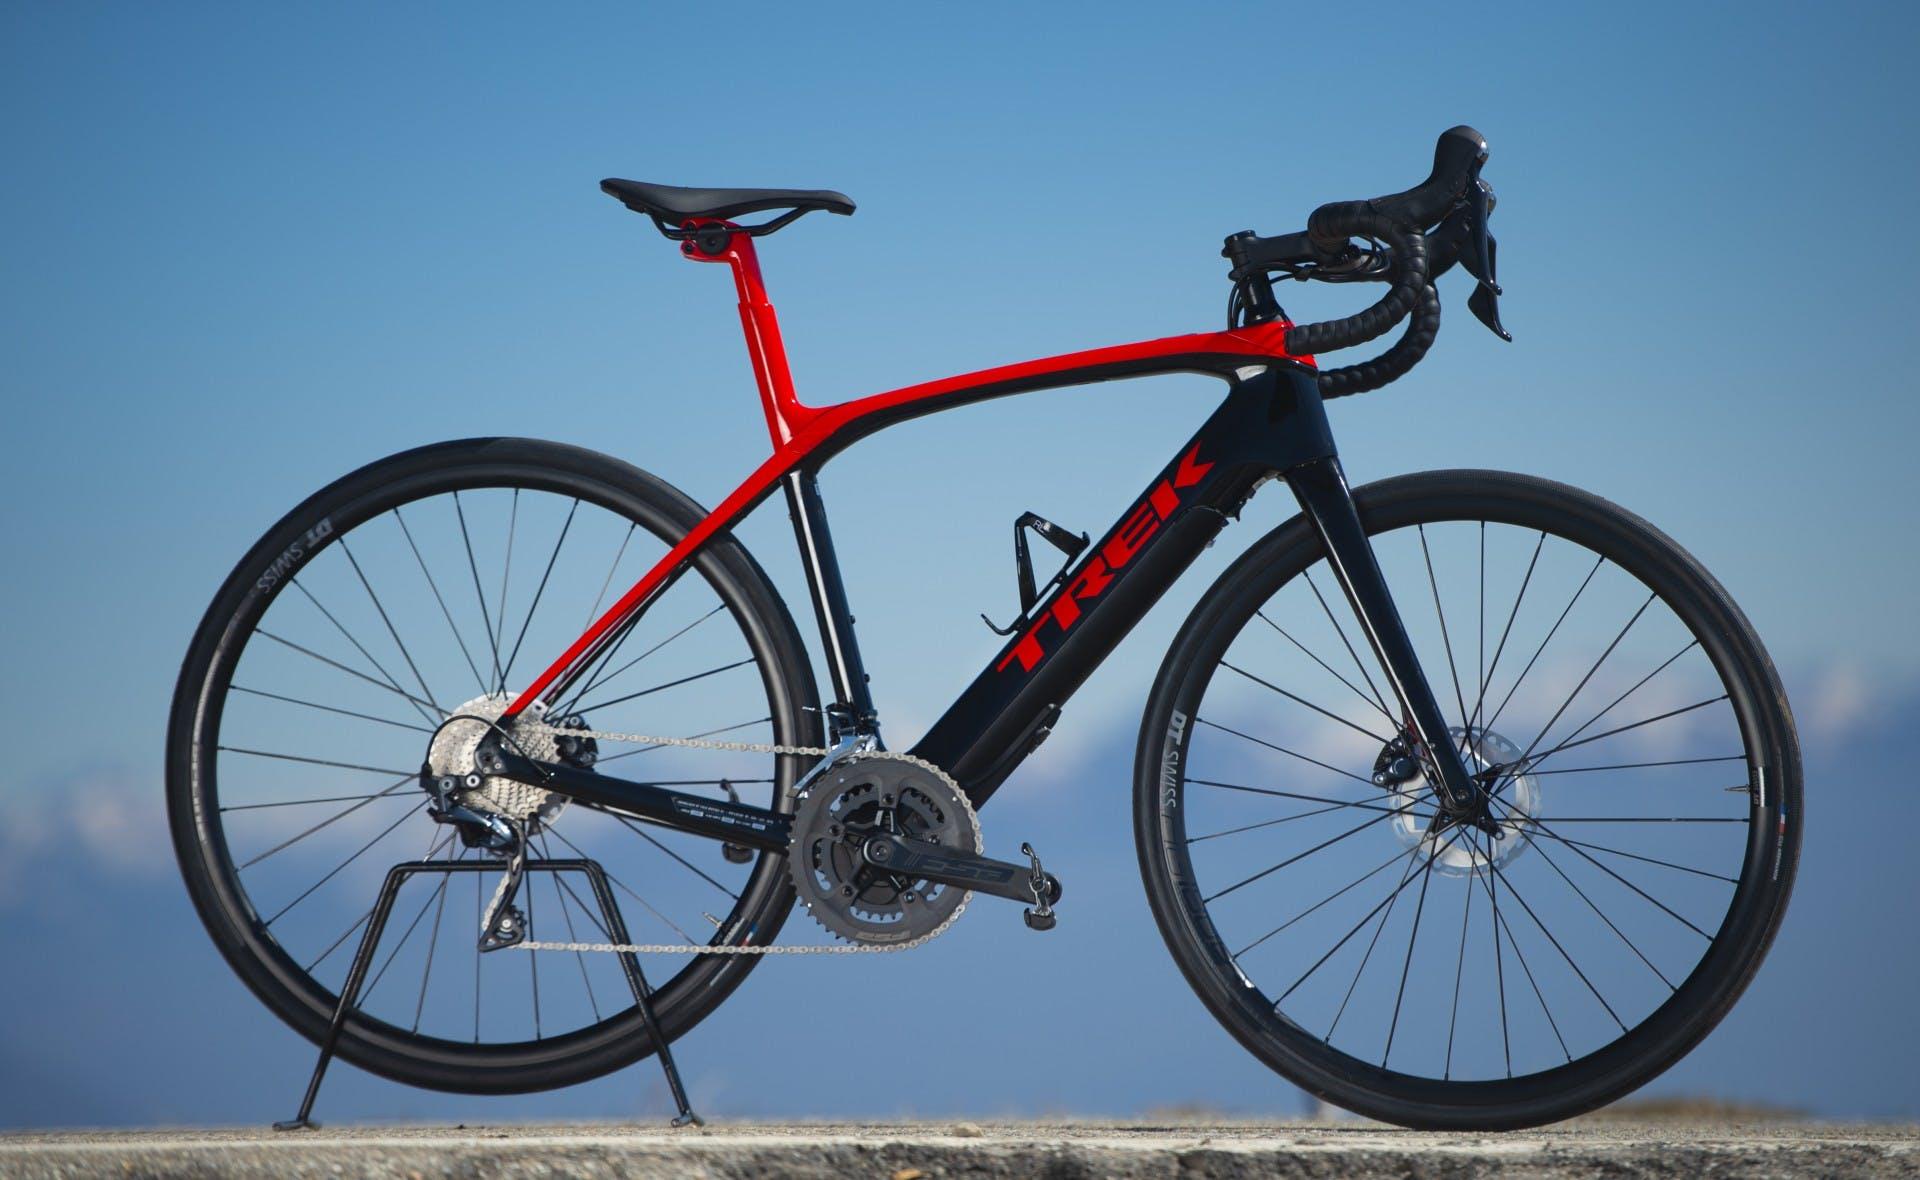 bici elettrica trek Domane+ LT foto statica in esterni laterale